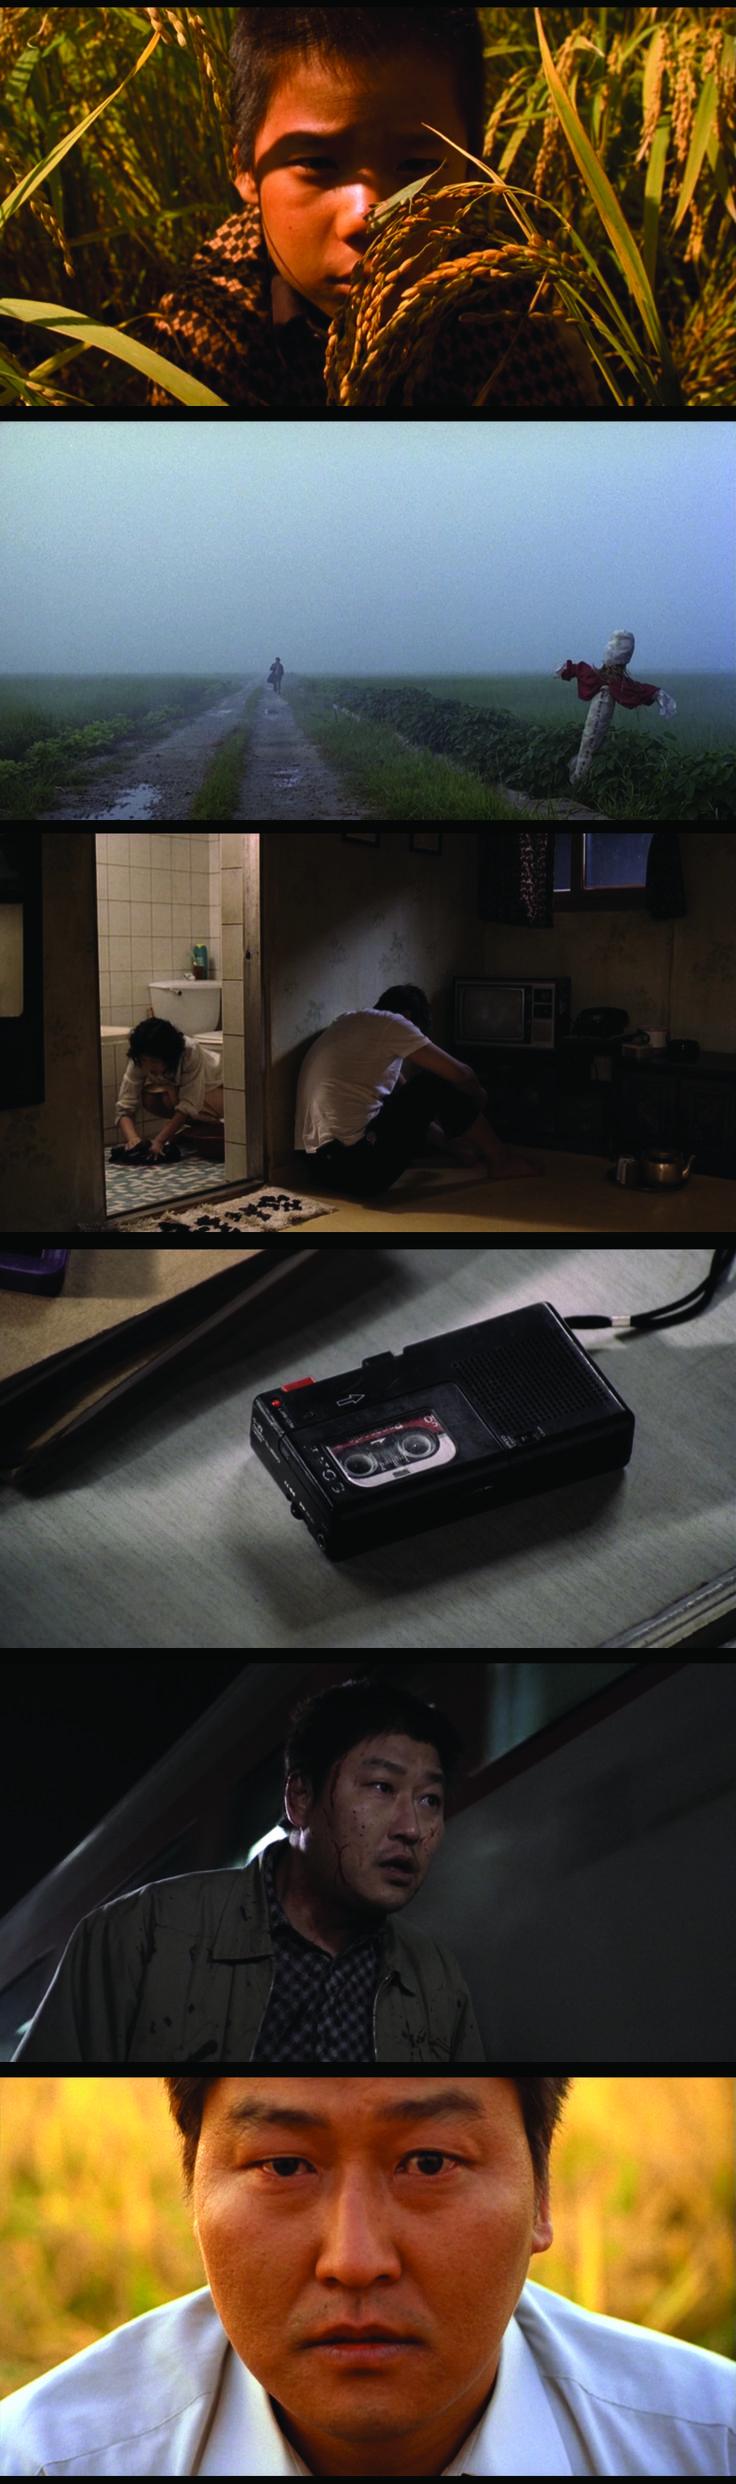 Memories of Murder (2003), directed by Joon Ho Bong.